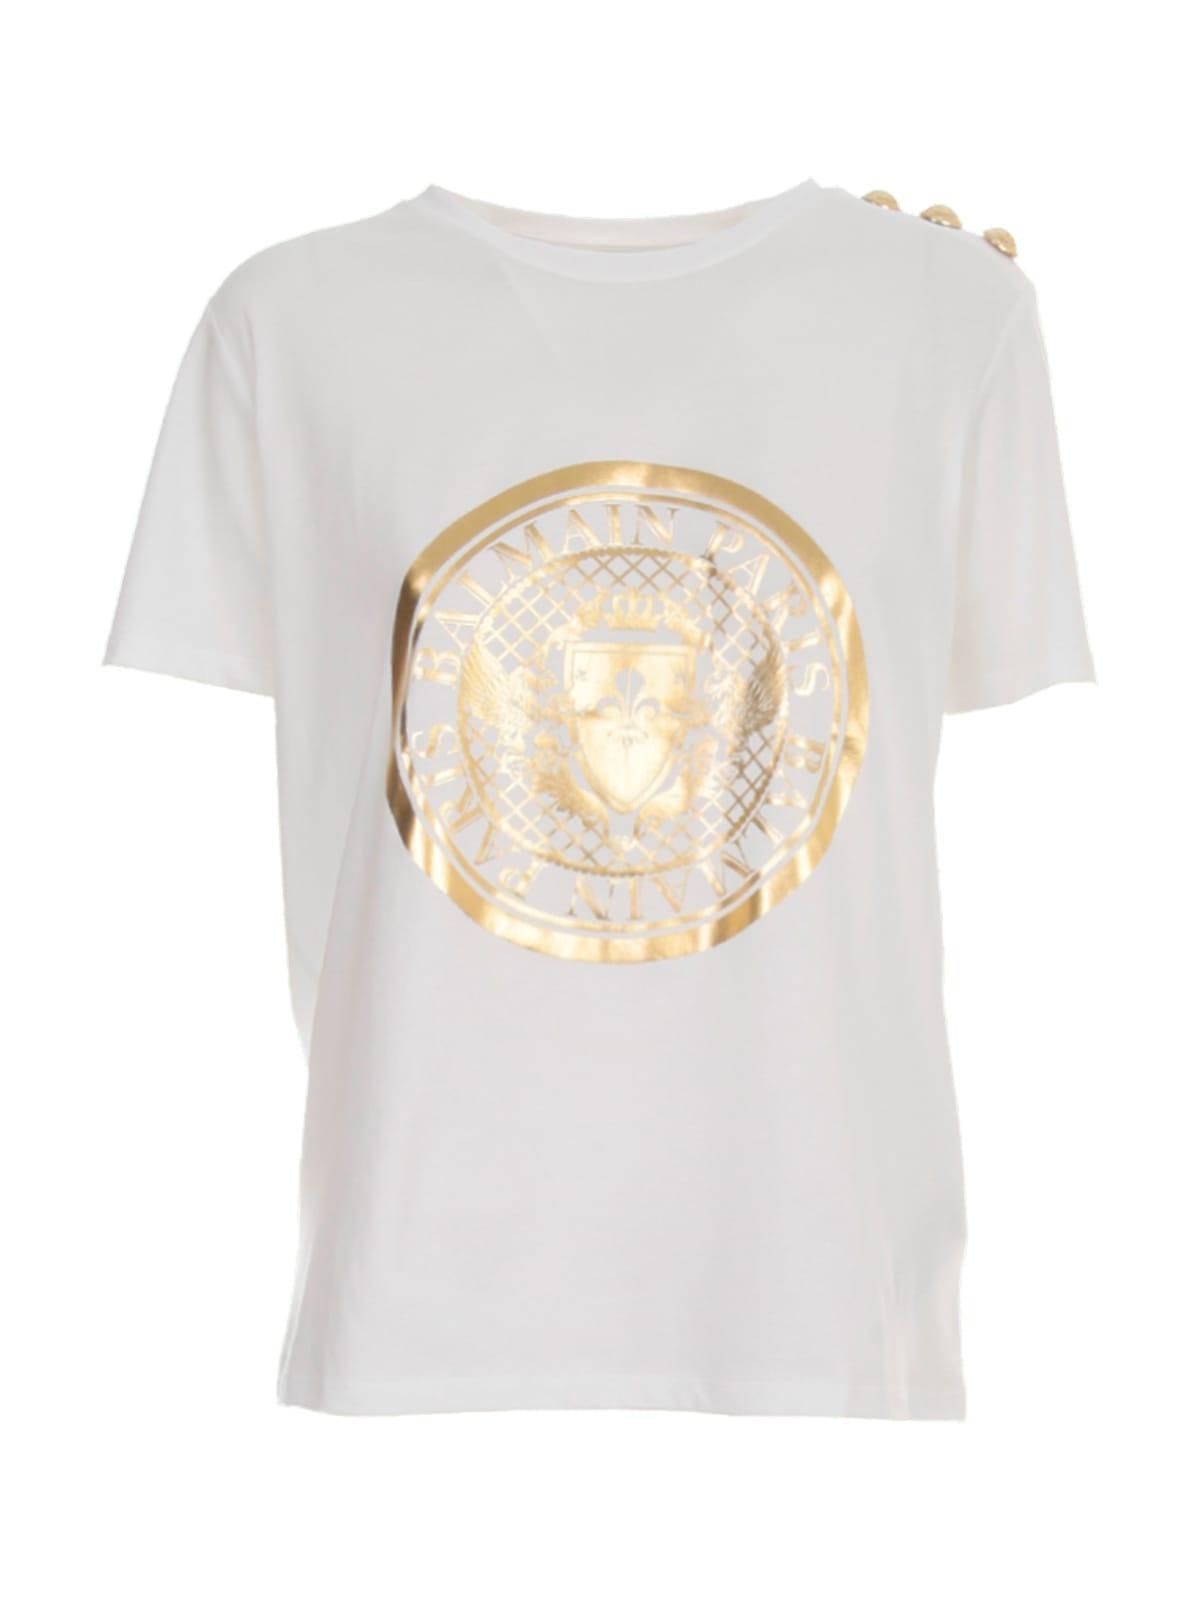 Balmain Ss 3 Btn Metallic Coin T-shirt